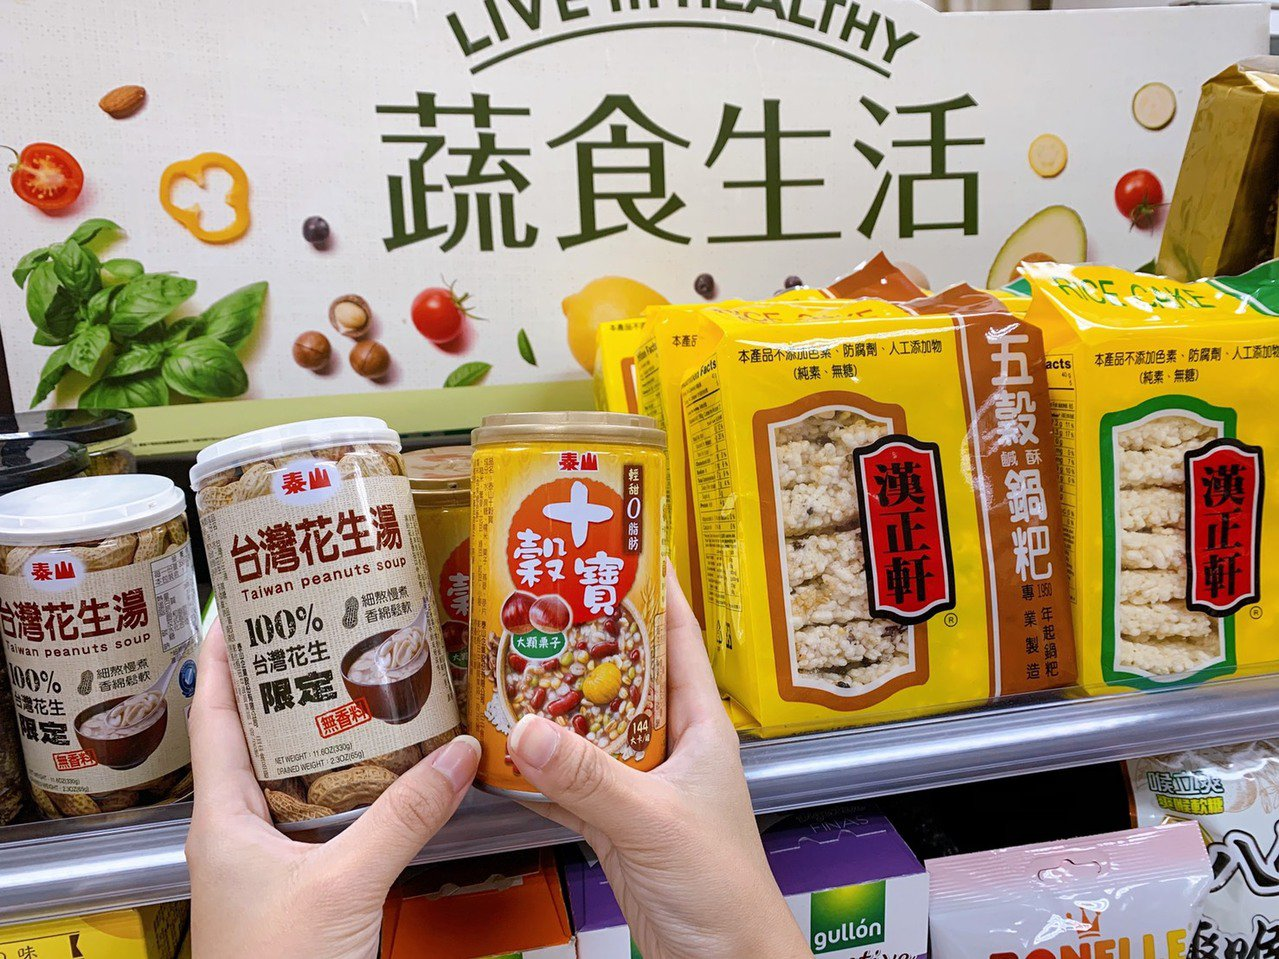 7-ELEVEN「LIVE in HEALTHY蔬食生活」專櫃提供零食、泡麵等共...